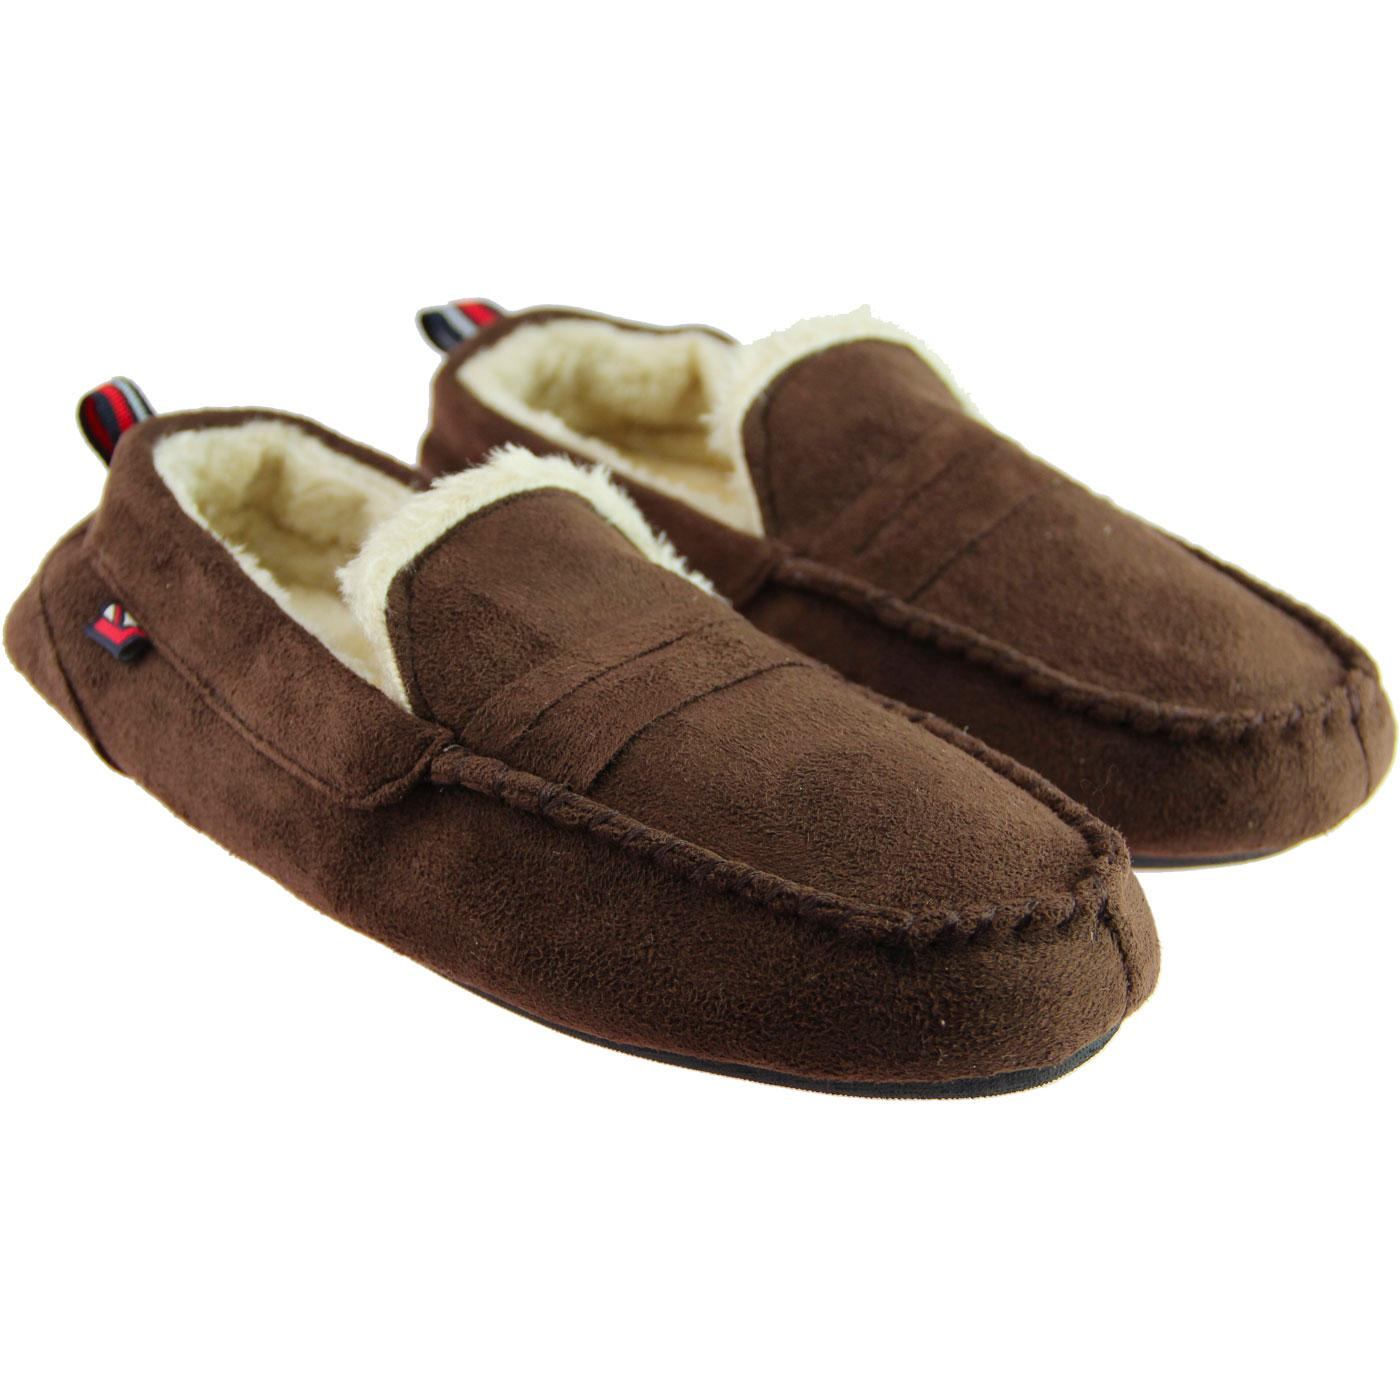 36d20f2de385 BEN SHERMAN Four Seasons Mod Moccasin Slippers Brown